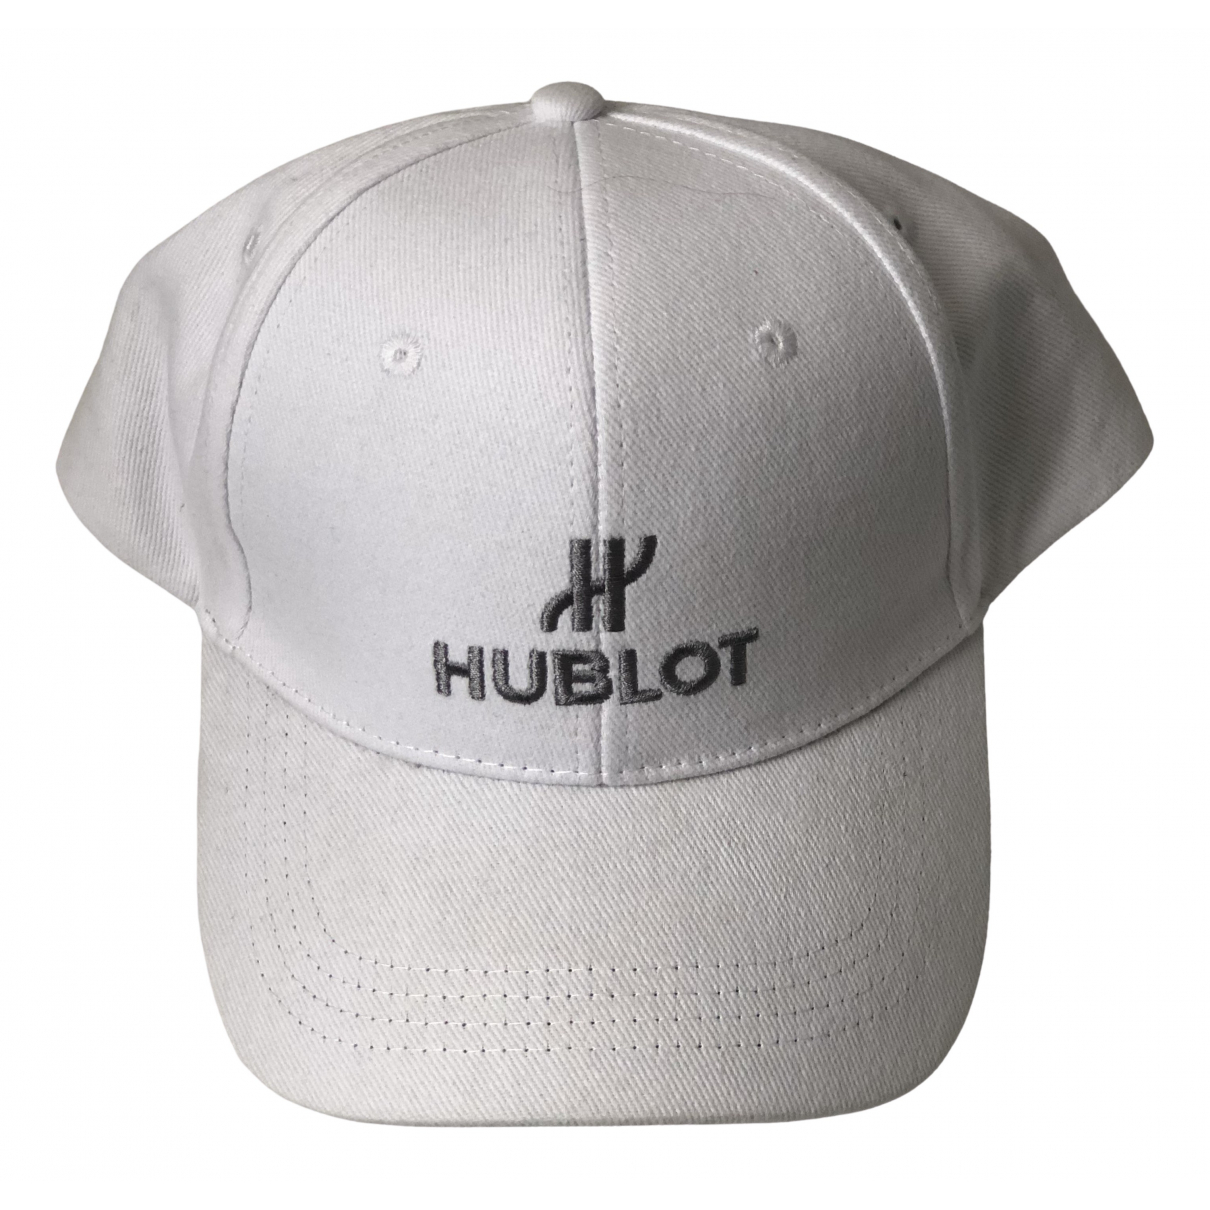 Sombrero / gorro Hublot